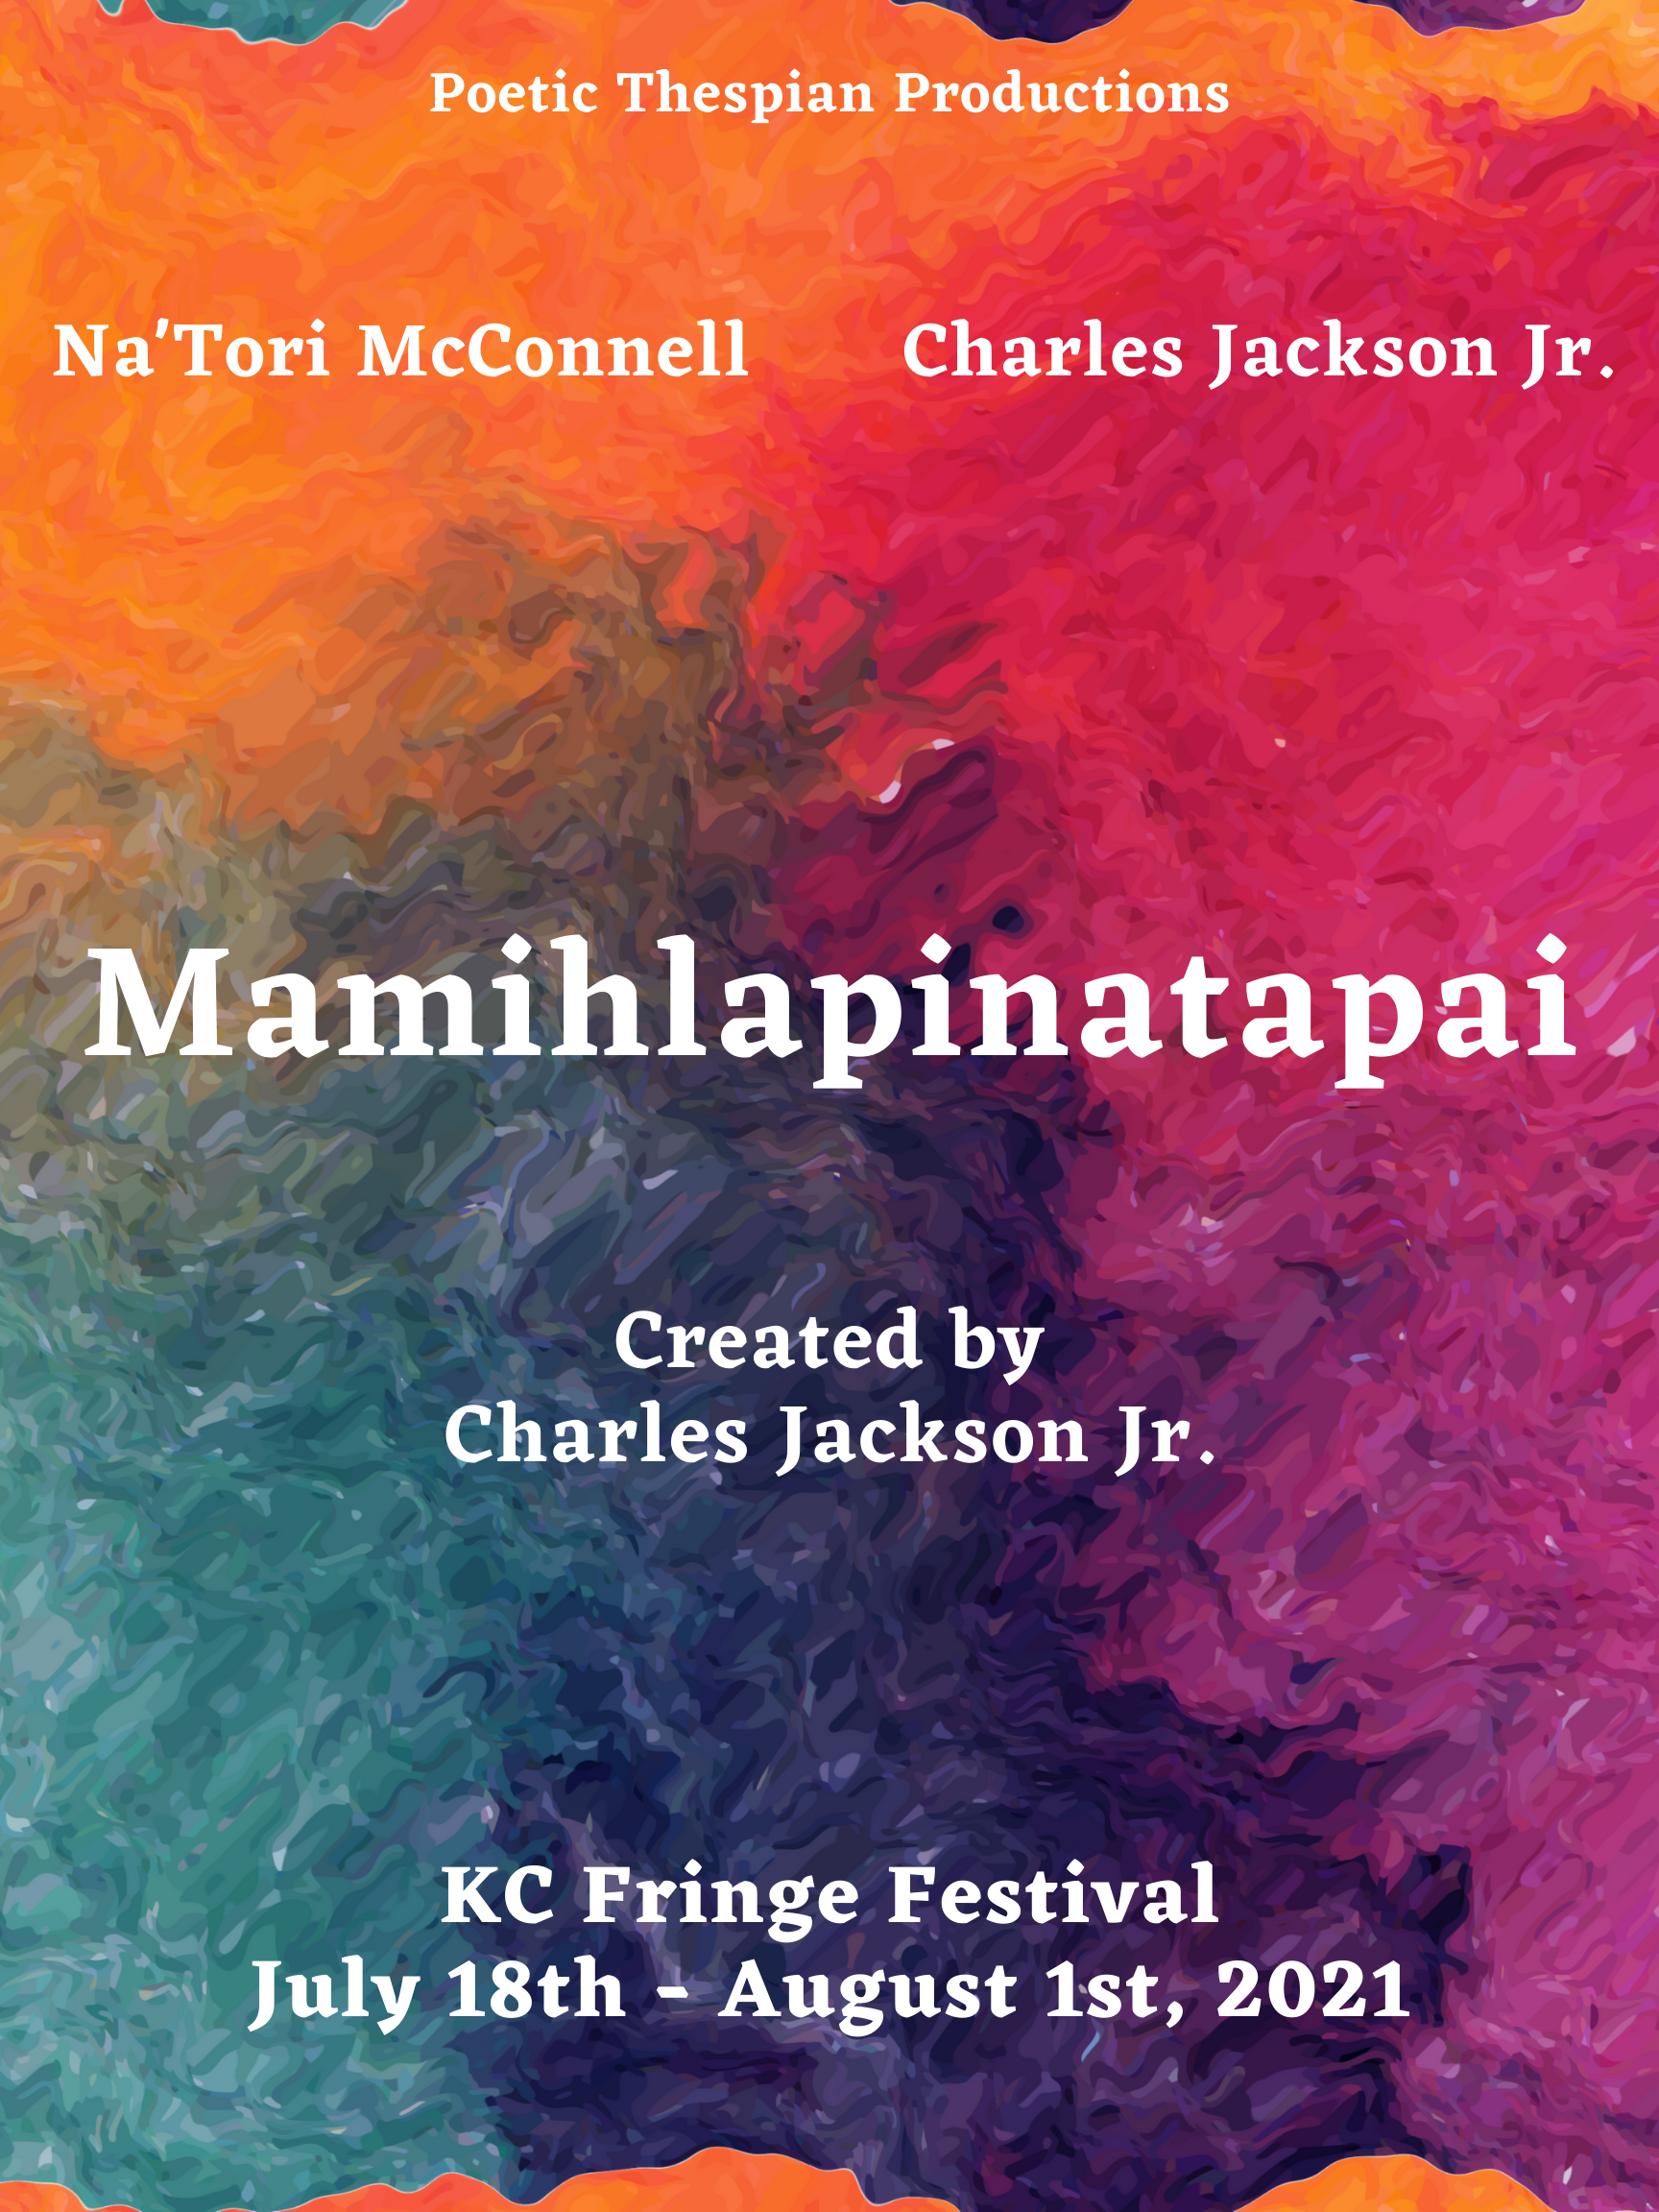 Mamihlapinatapai official poster